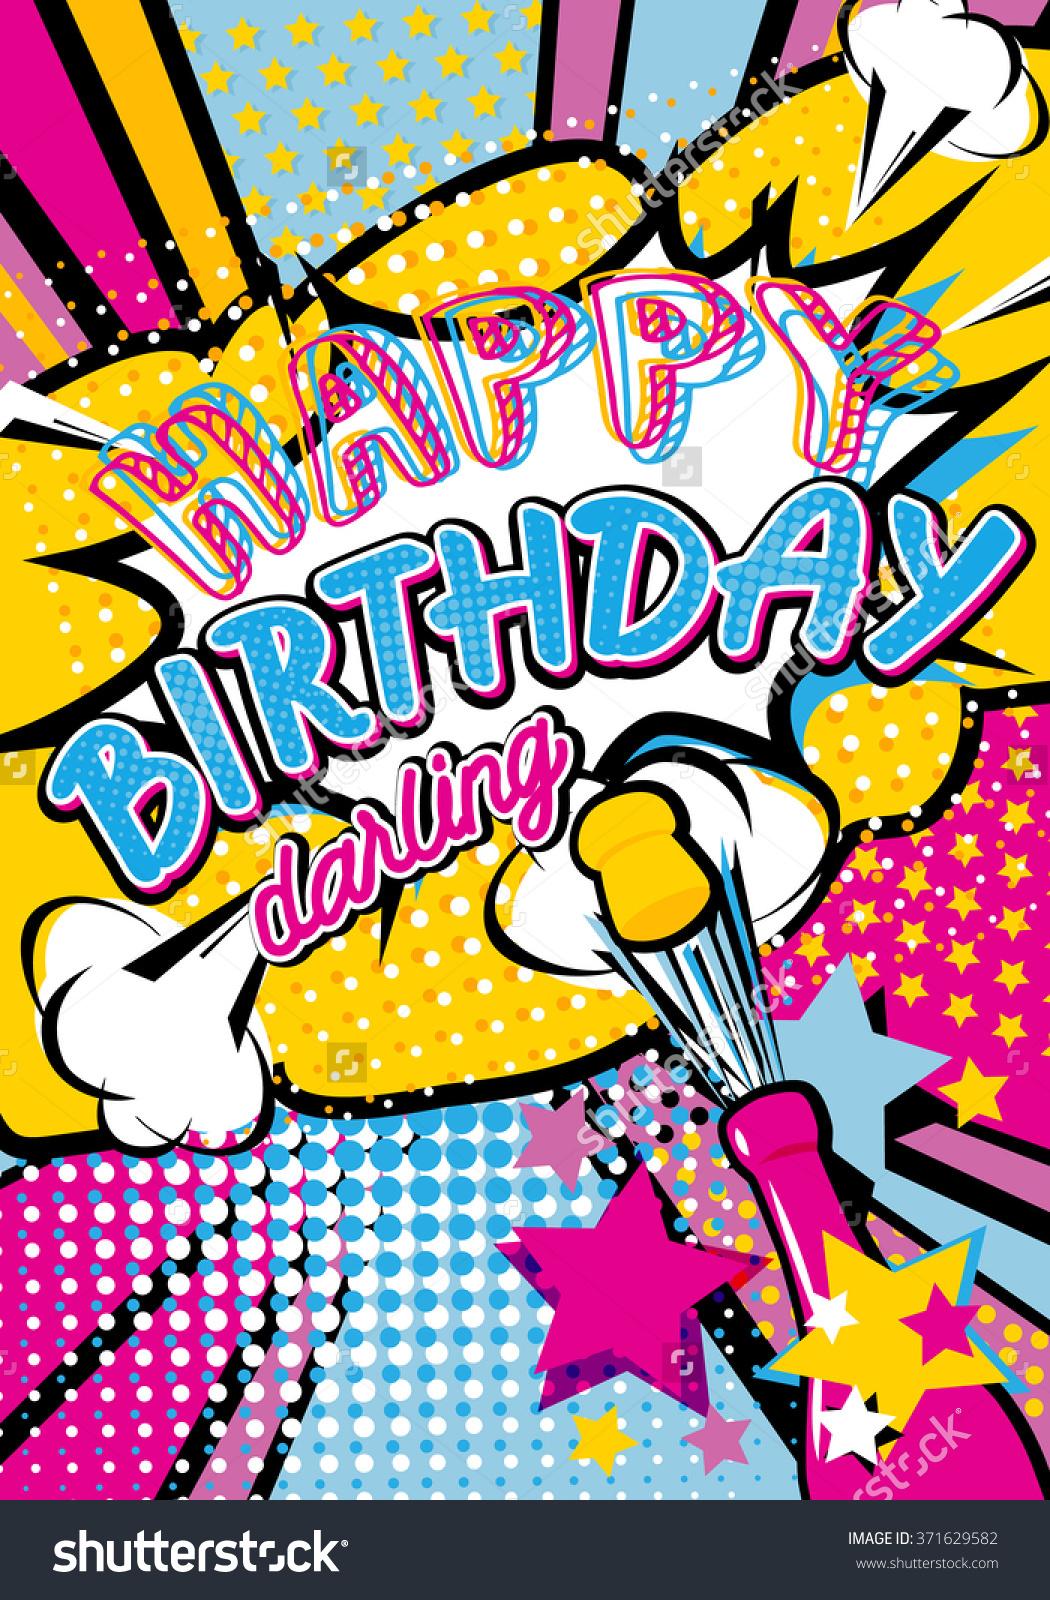 Pop Art clipart happy birthday #12